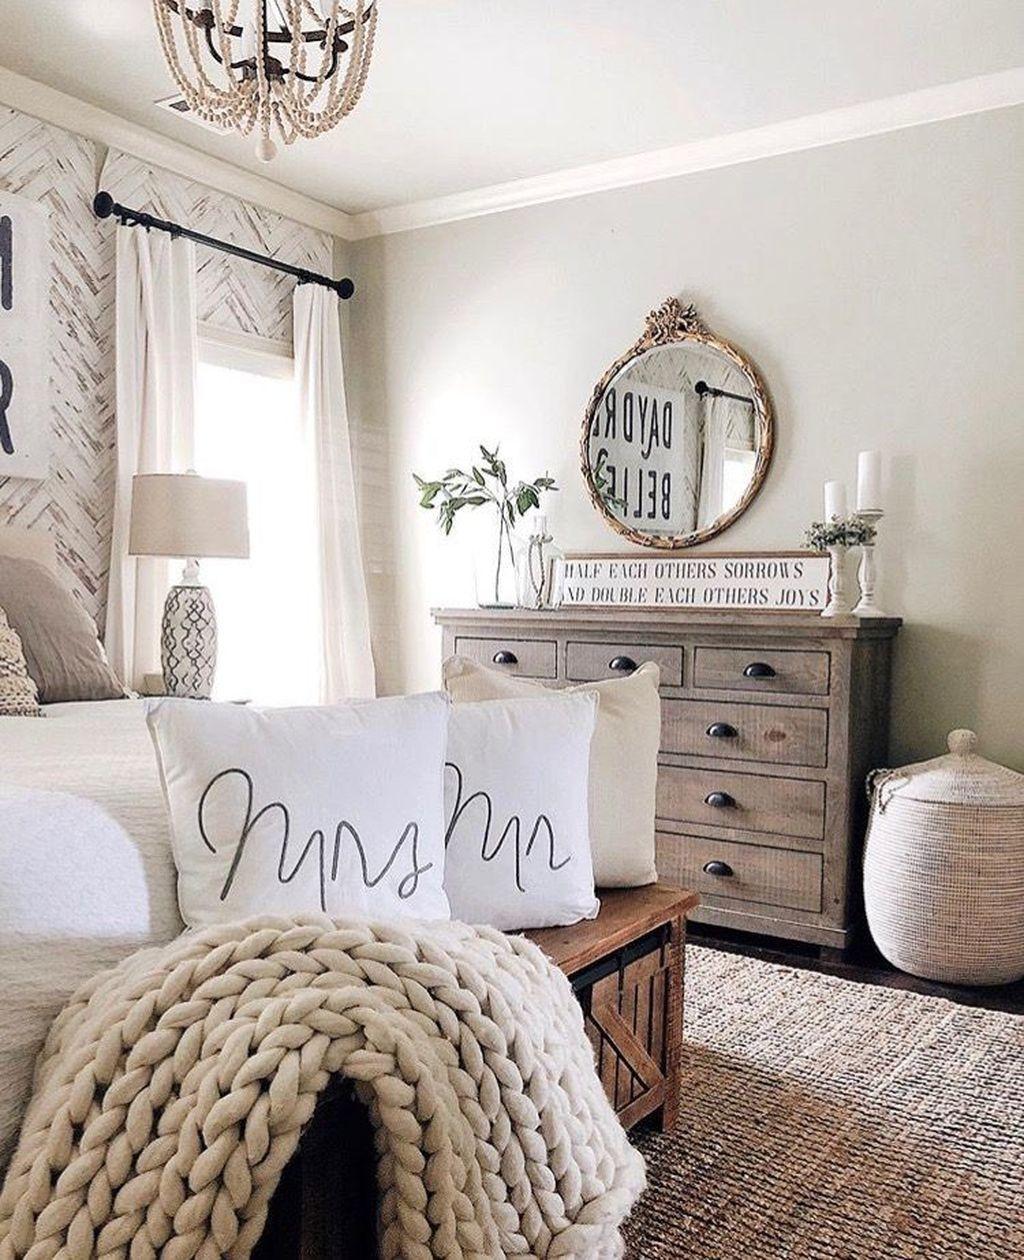 30 Enchanting Farmhouse Bedroom Ideas For Your House Design Master Bedrooms Decor Master Bedroom Ideas Farmhouse Relaxing Bedroom Farmhouse style bedroom decor